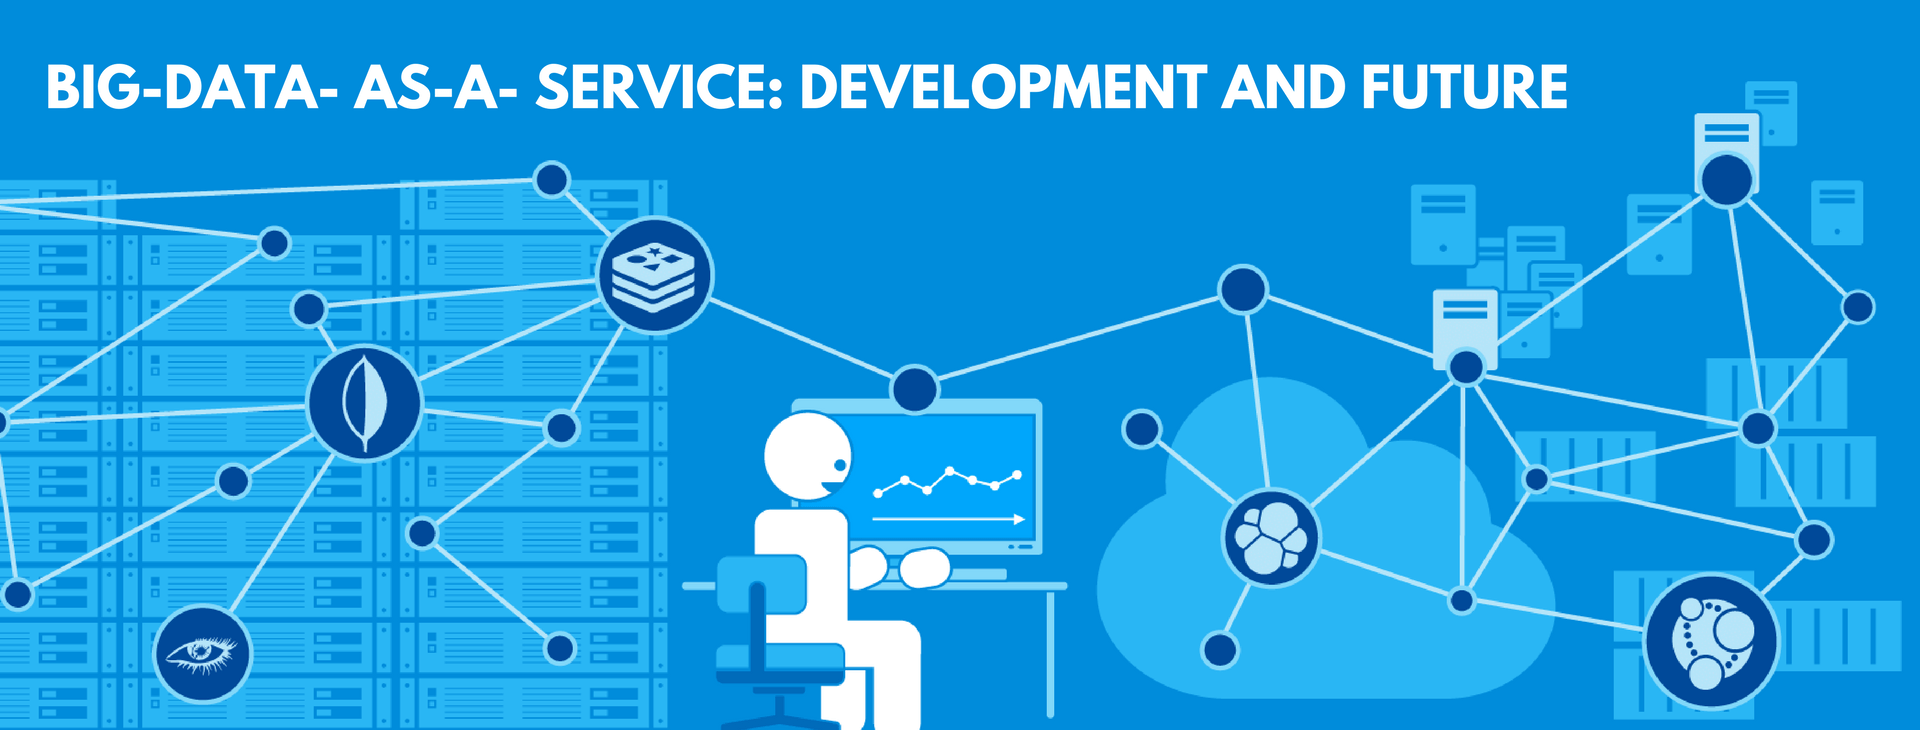 Big-Data-As-A-Service: Development and Future - Researcher's